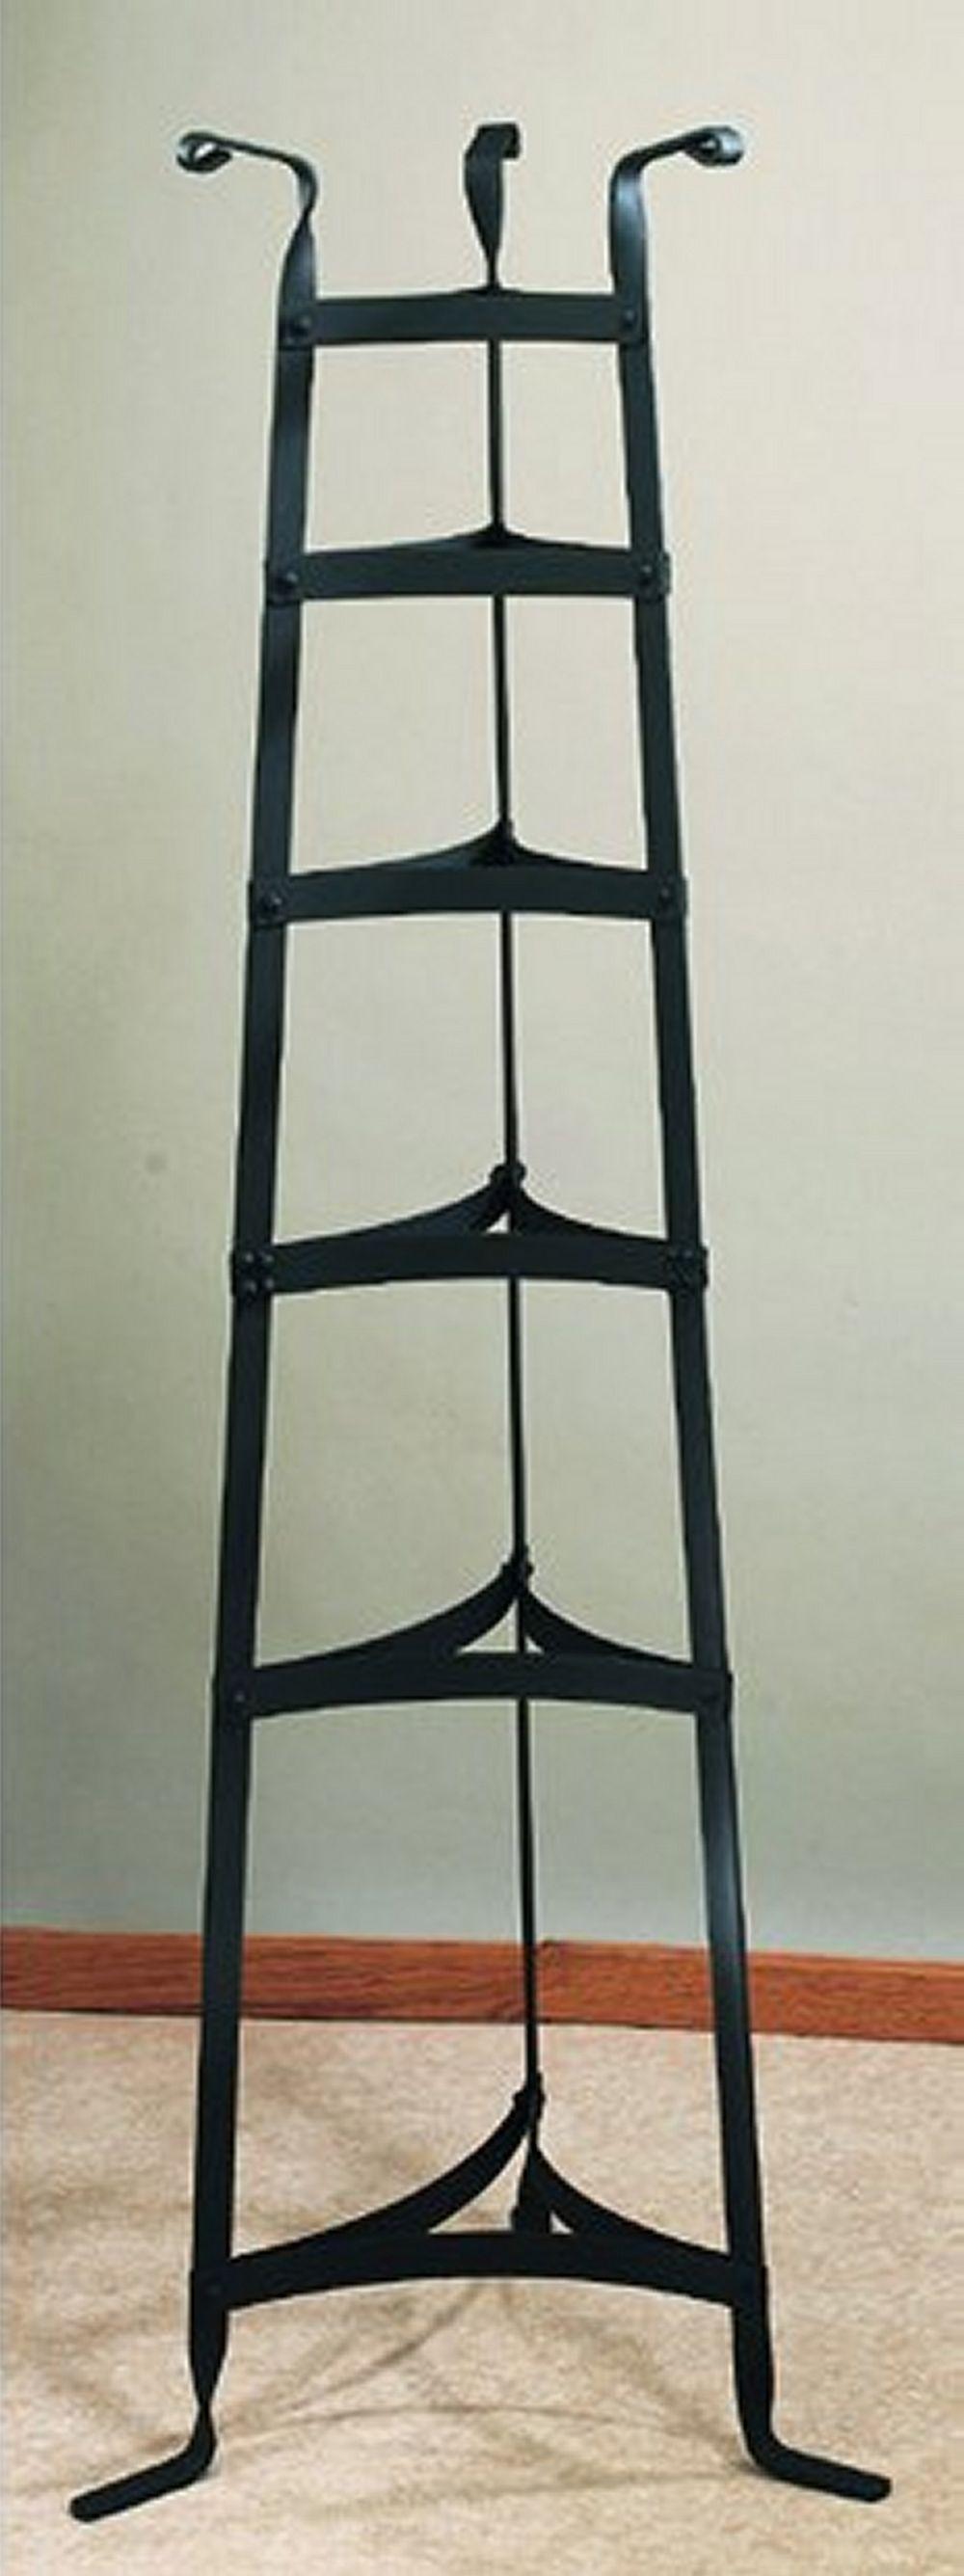 "Old Dutch International 106GU 60 1/2"" Six Shelf Graphite Cookware Stand"